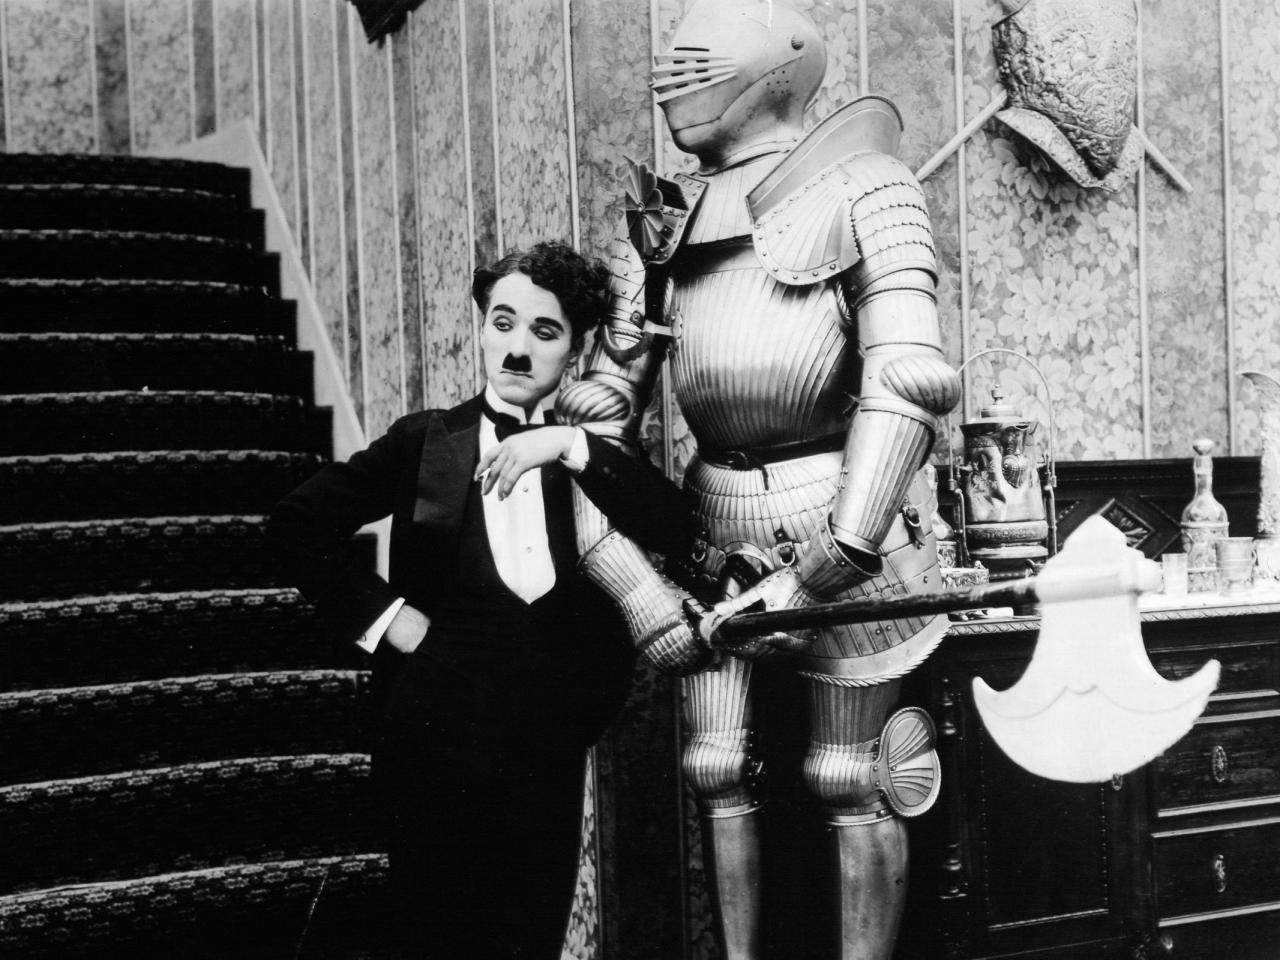 Charlie Chaplin Wallpaper 1280x960jpg 1280x960